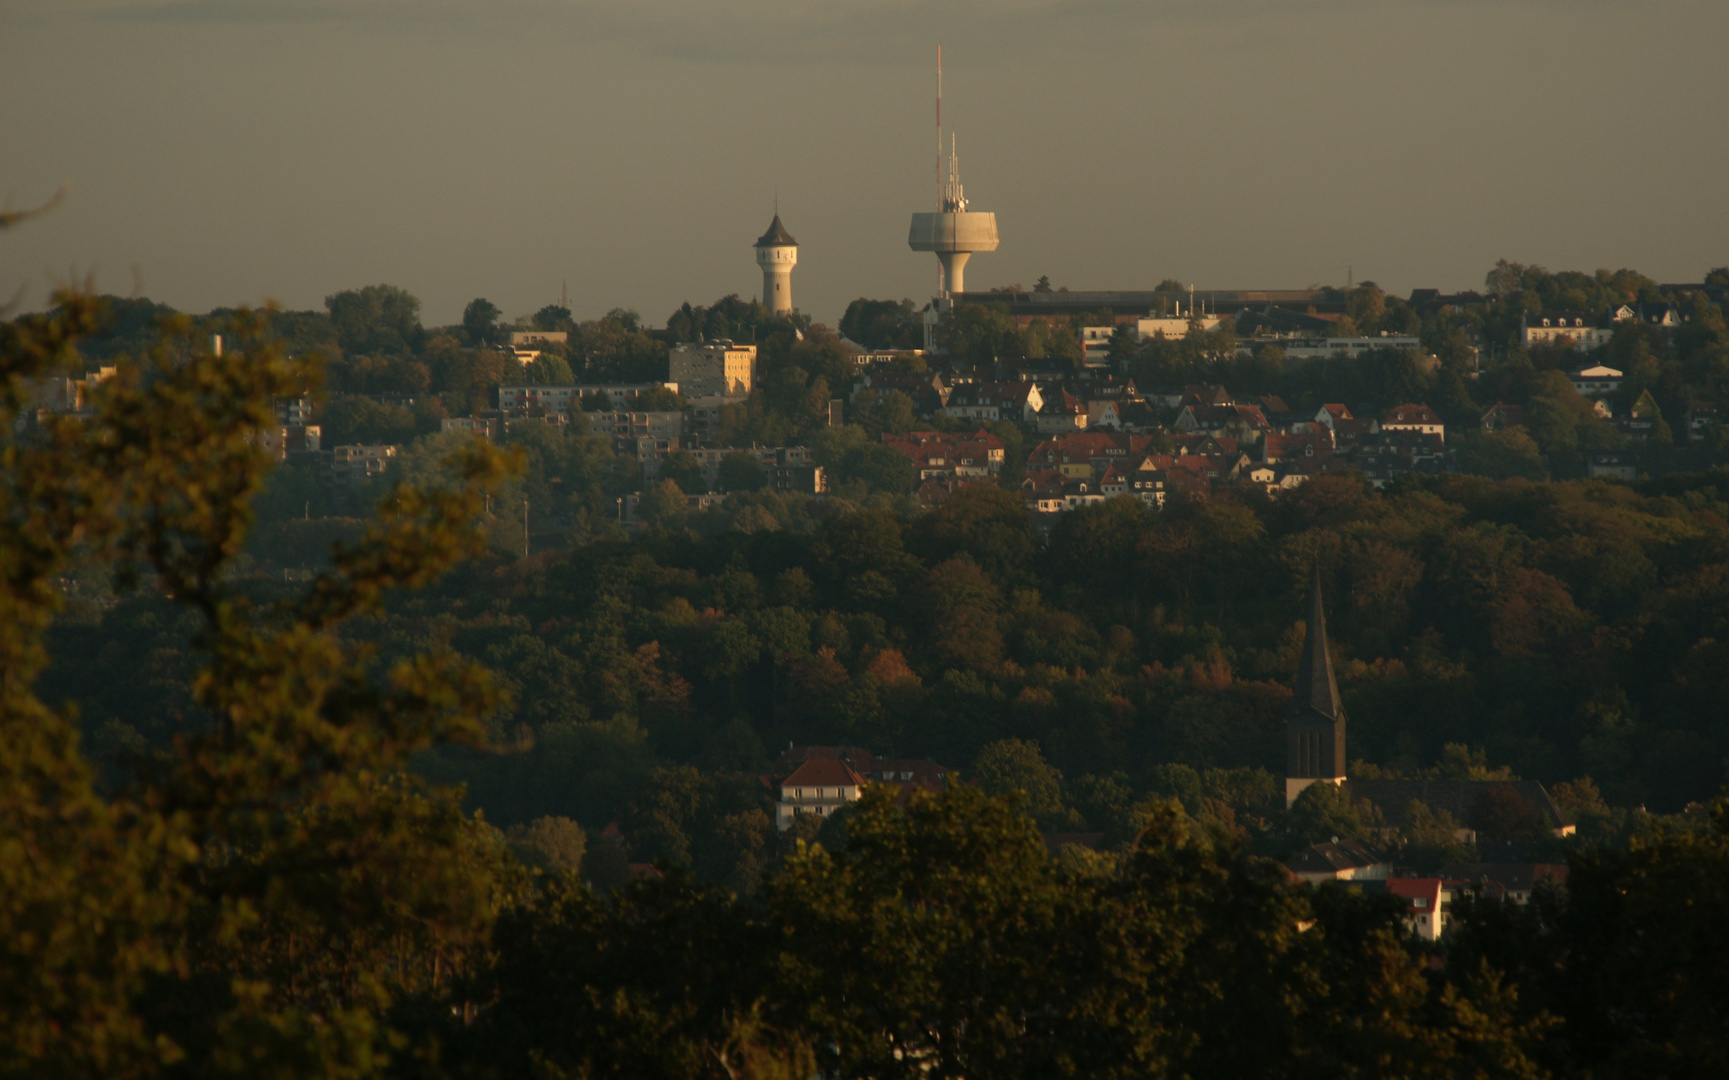 Fernblick zu den Wassertürmen-Wuppertal